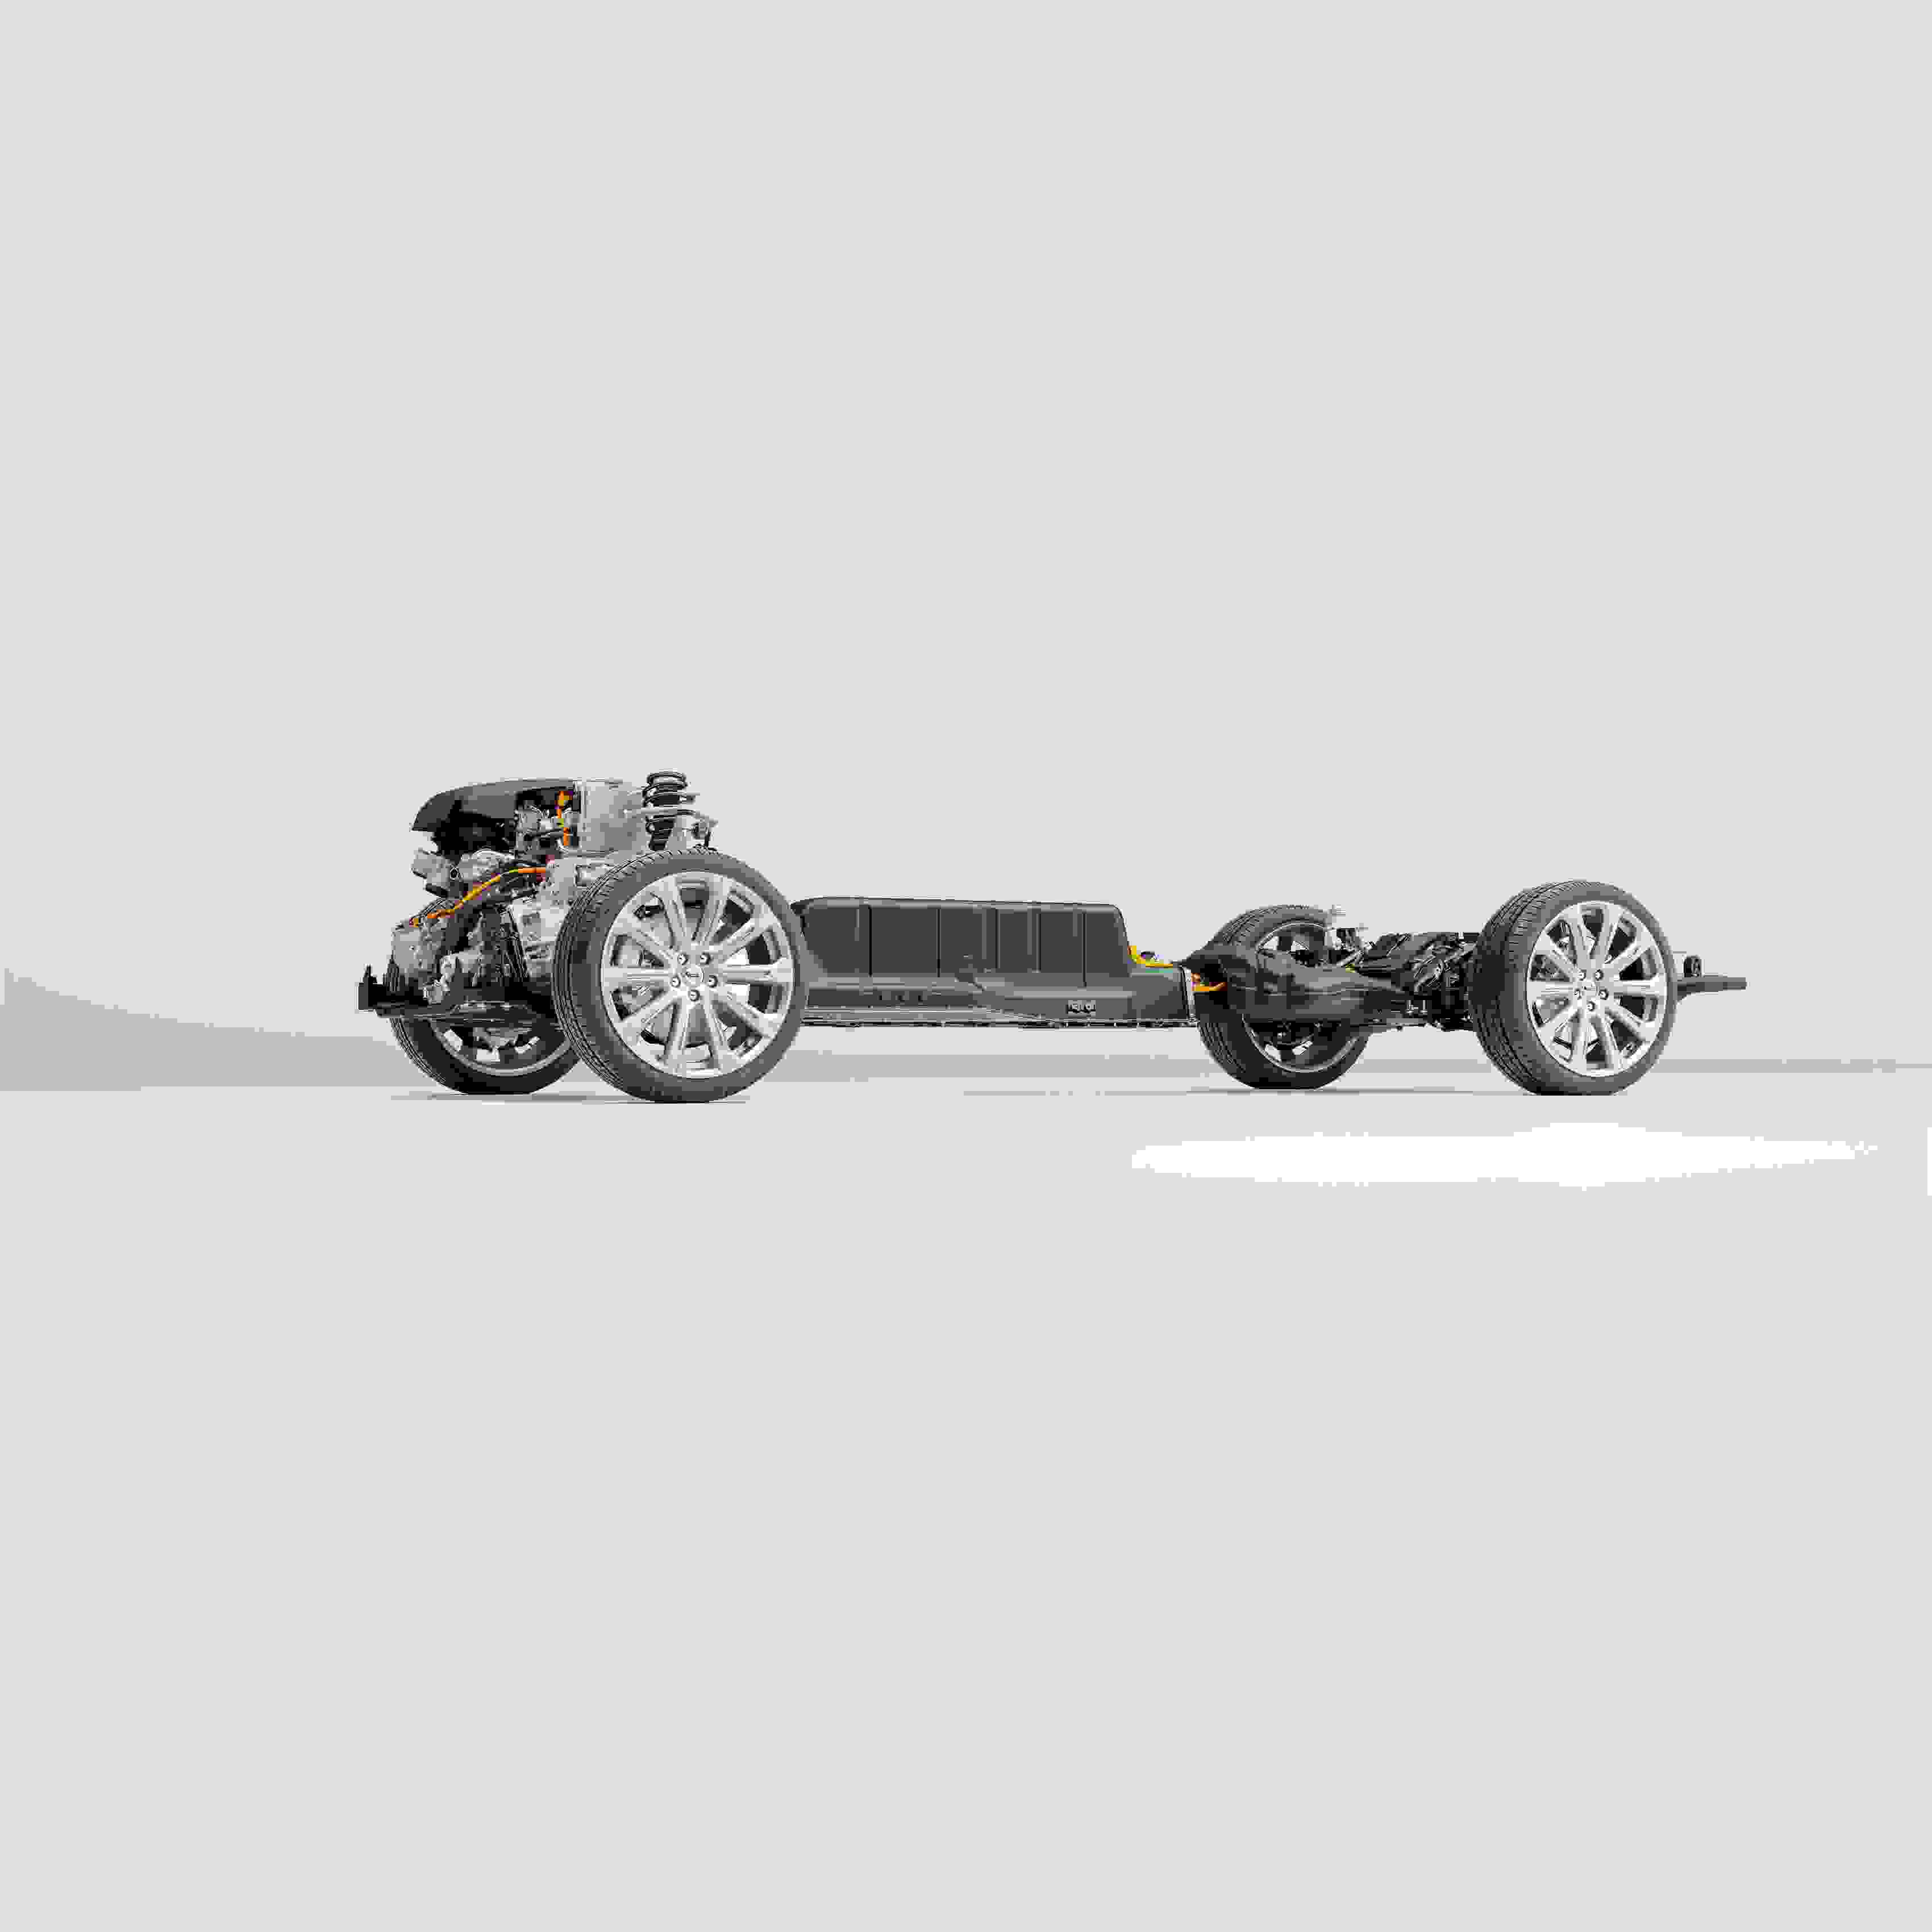 2048 Technical Cutaway Volvo Cars New Recharge Plug In Hybrid Powertrain